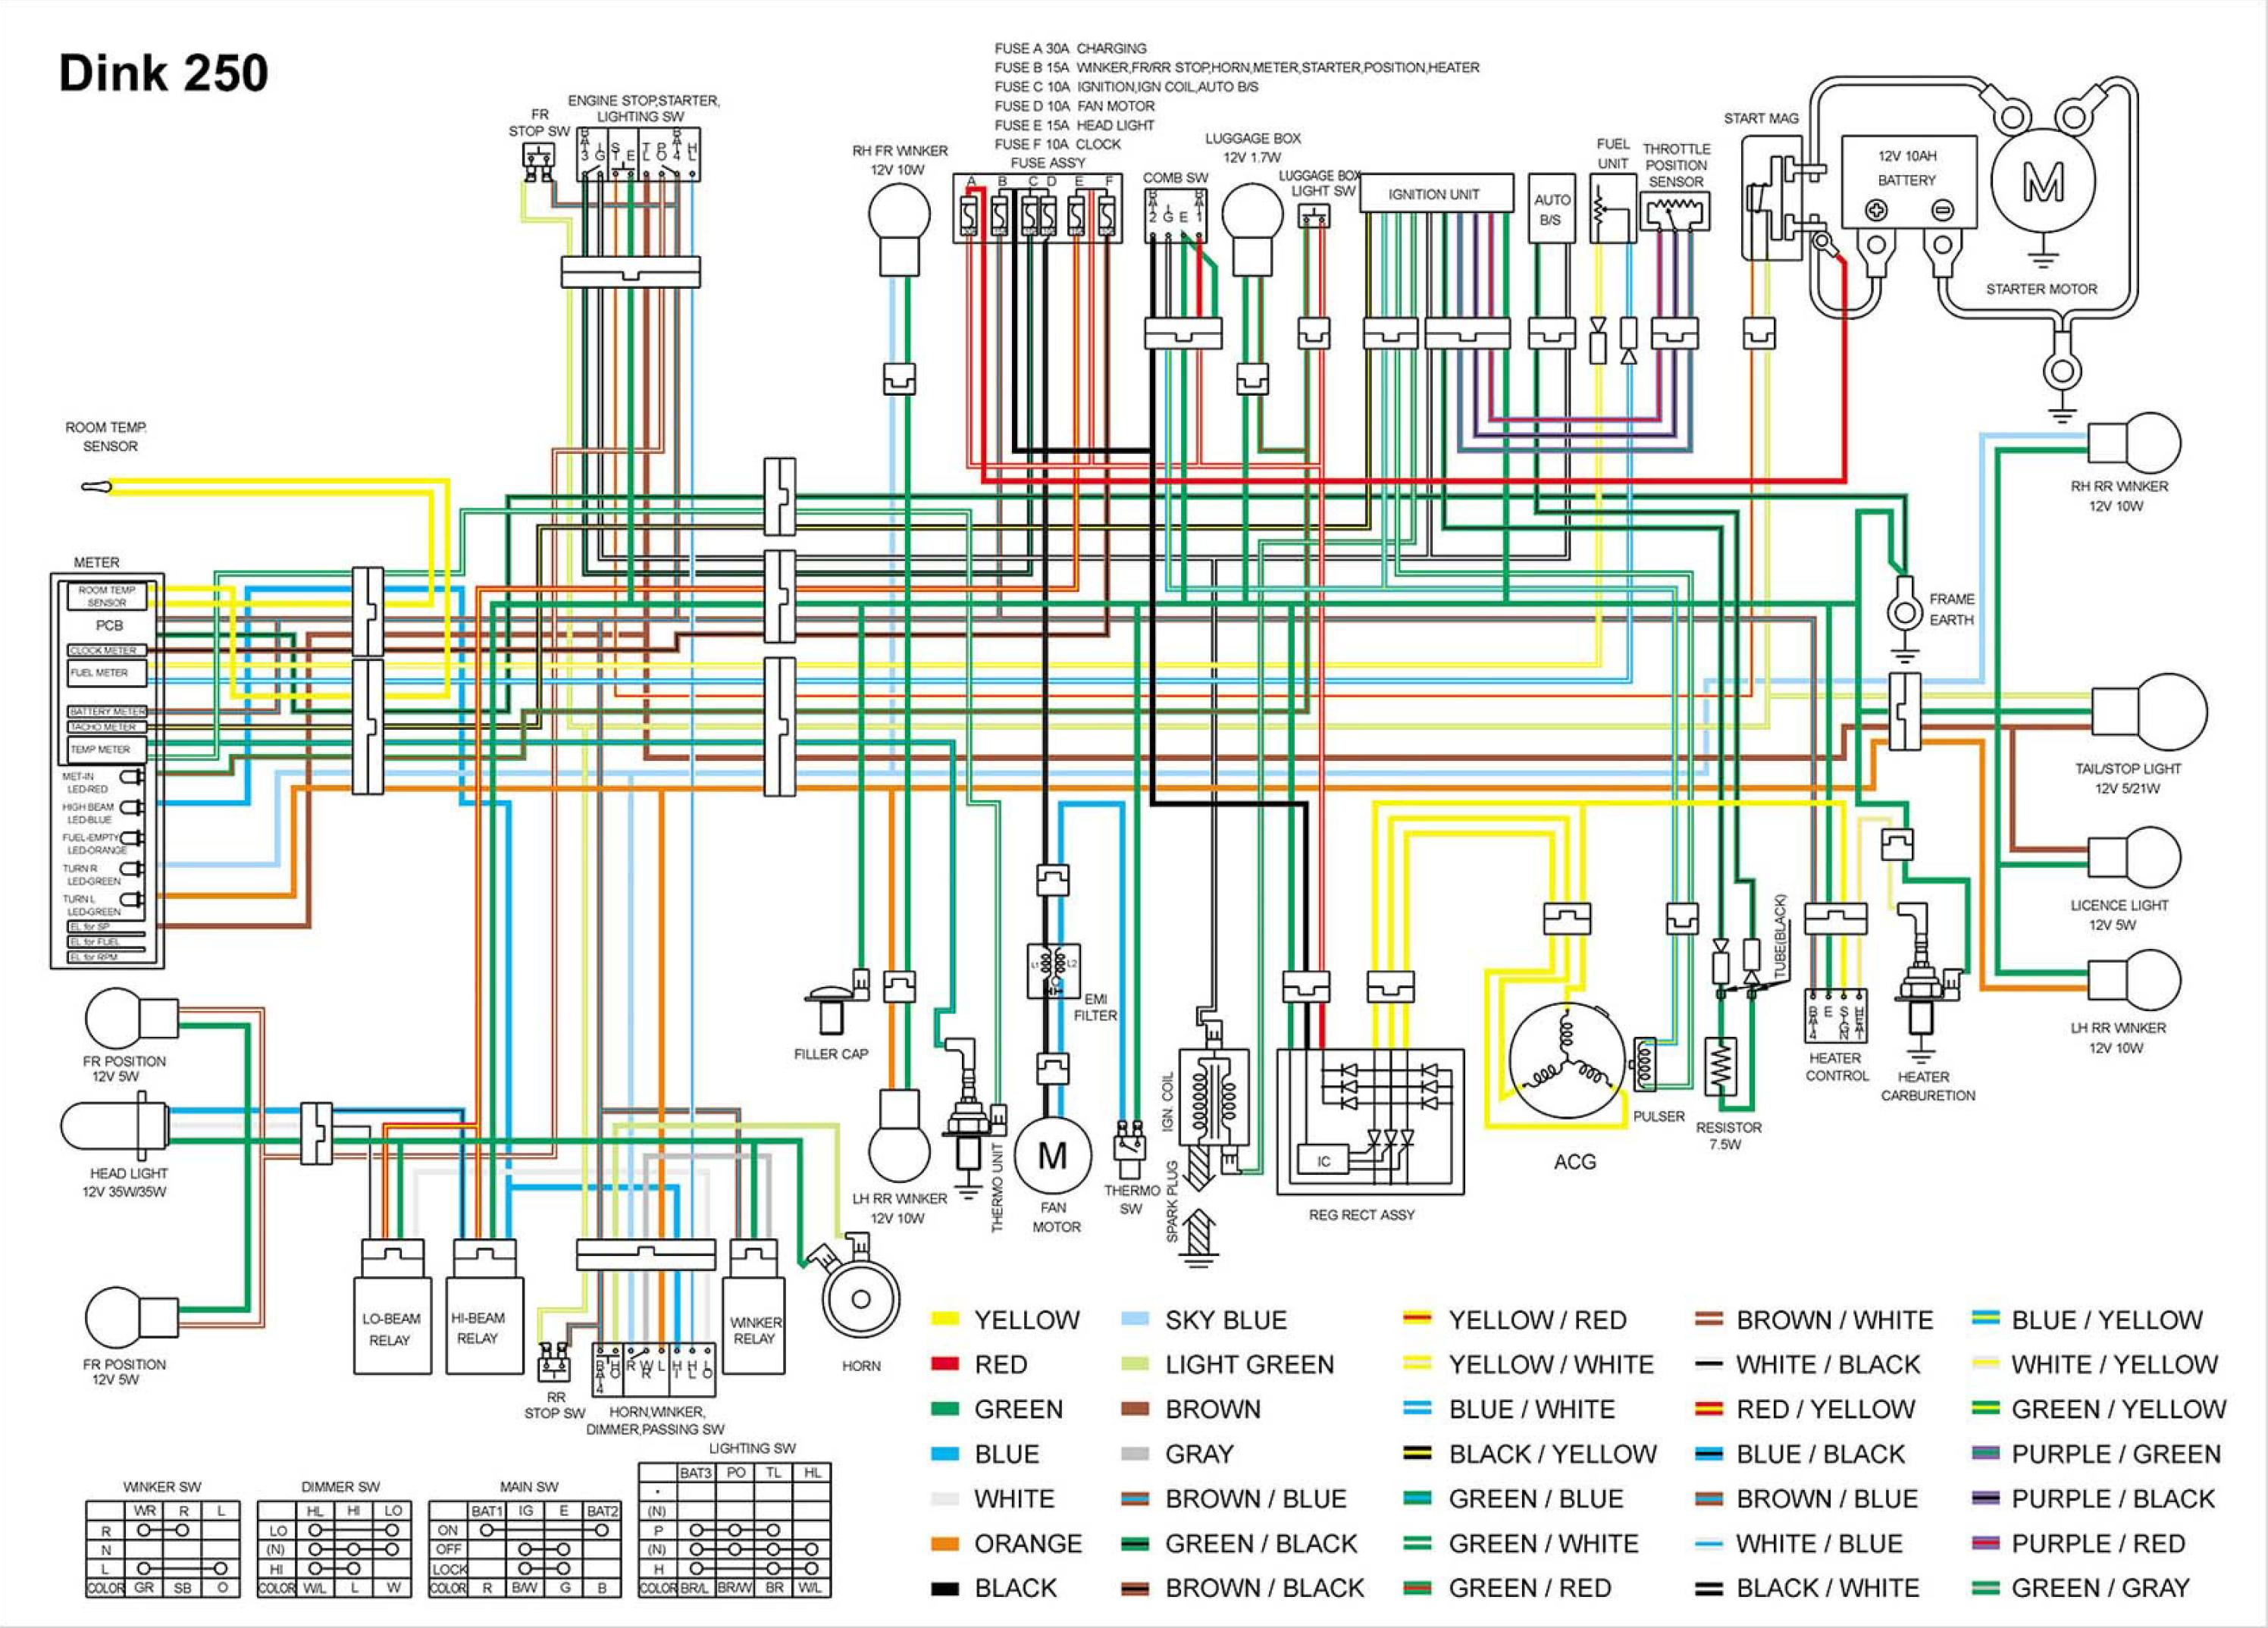 Schwinn S350 Wiring Diagram Another Blog About 2002 Chevrolet Kodiak Electric Scooter Manual Rh Aeha Org